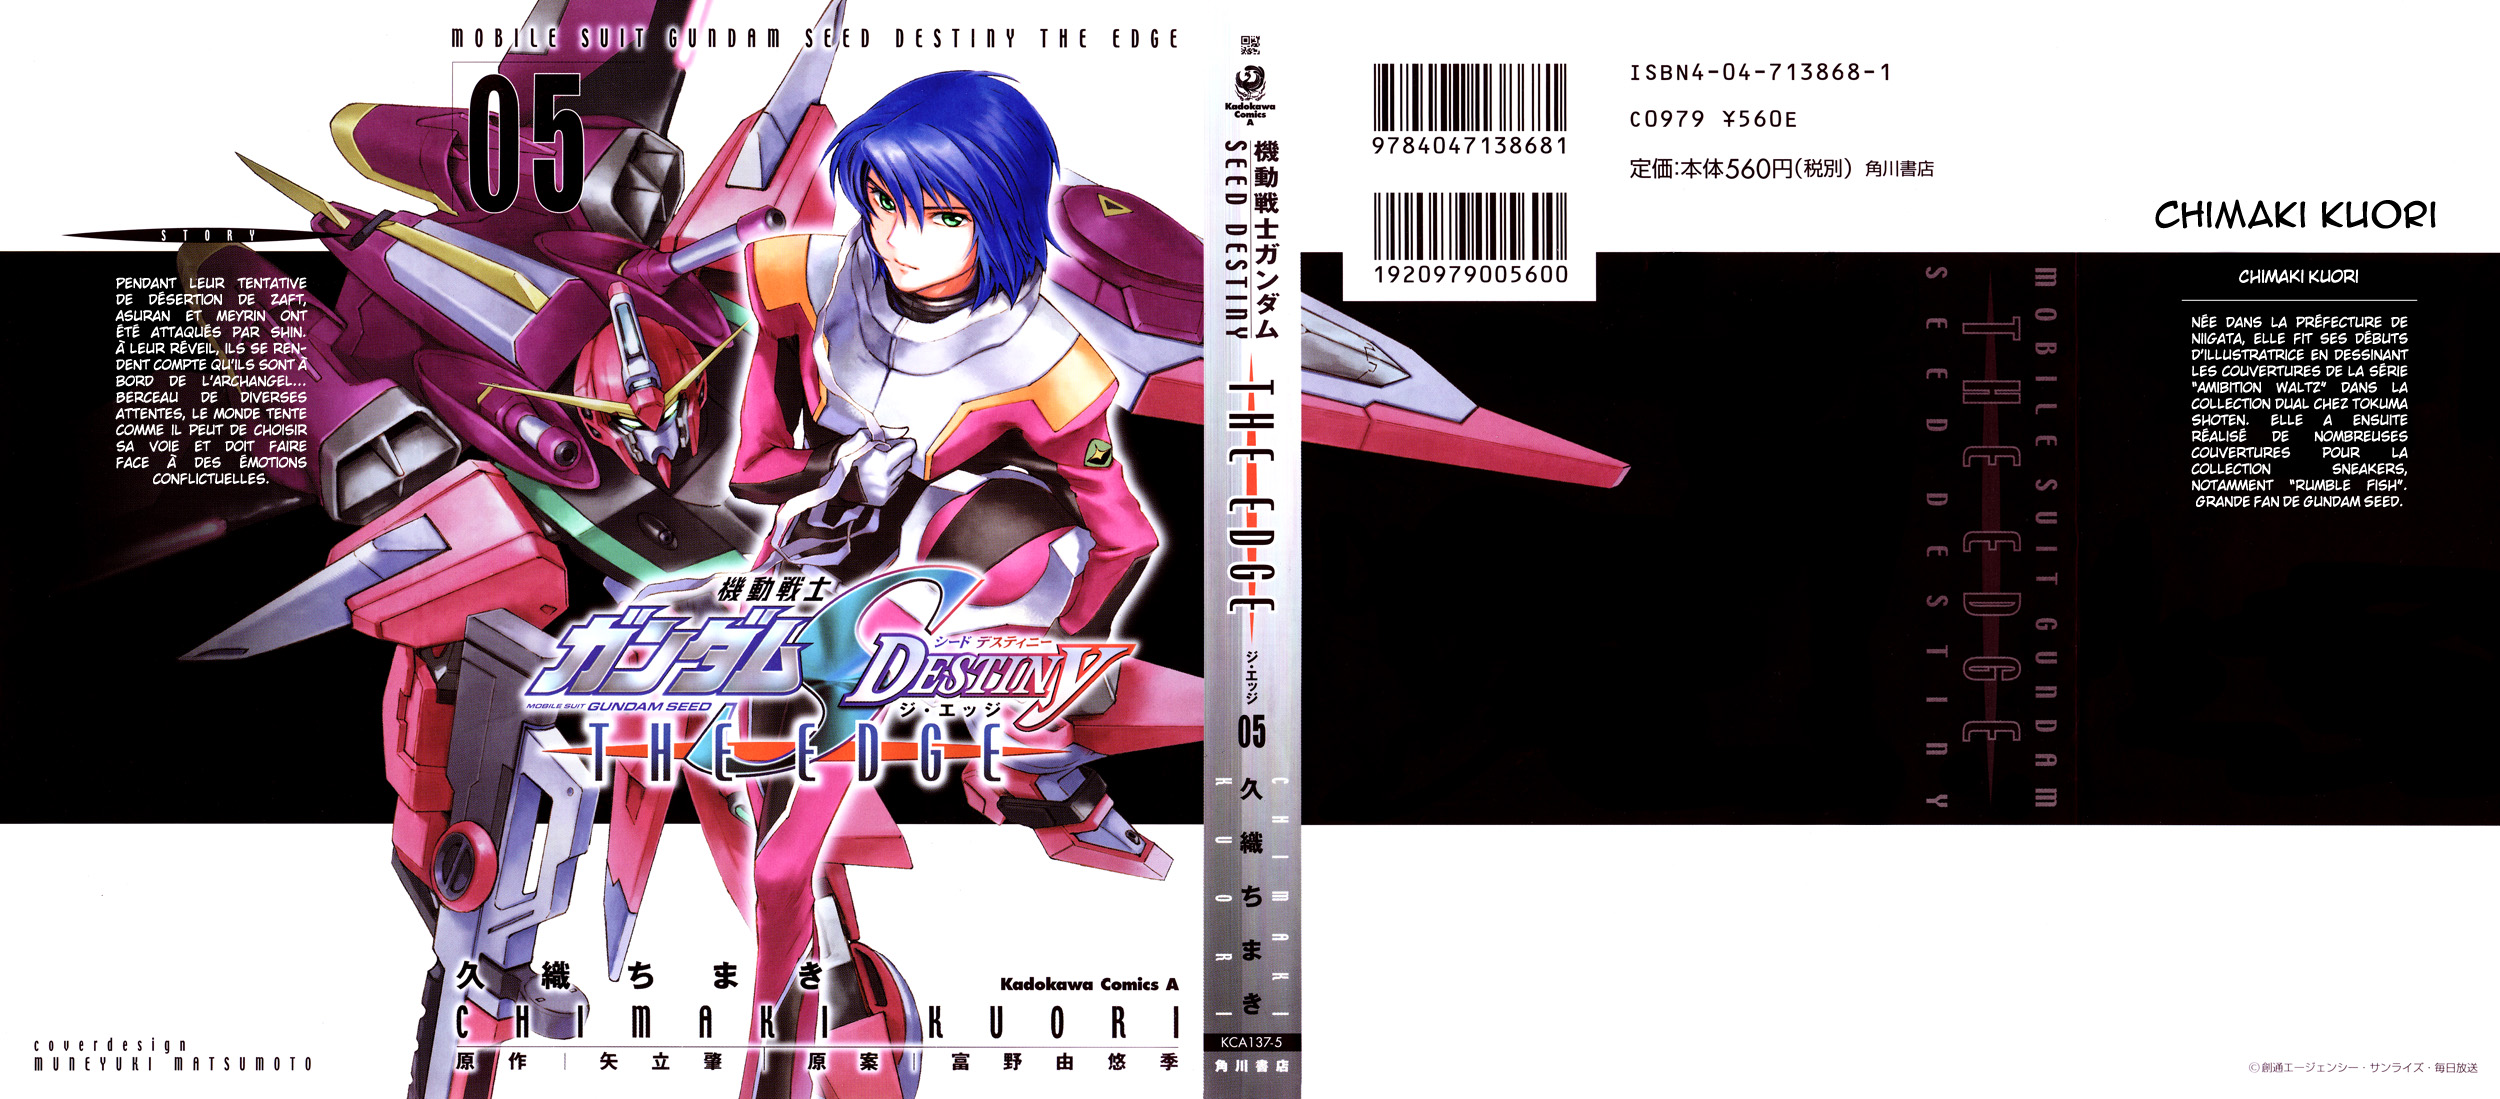 https://nine.mangadogs.com/fr_manga/pic1/12/1292/52390/KidouSenshiGundamSEEDDesti_0_922.jpg Page 1